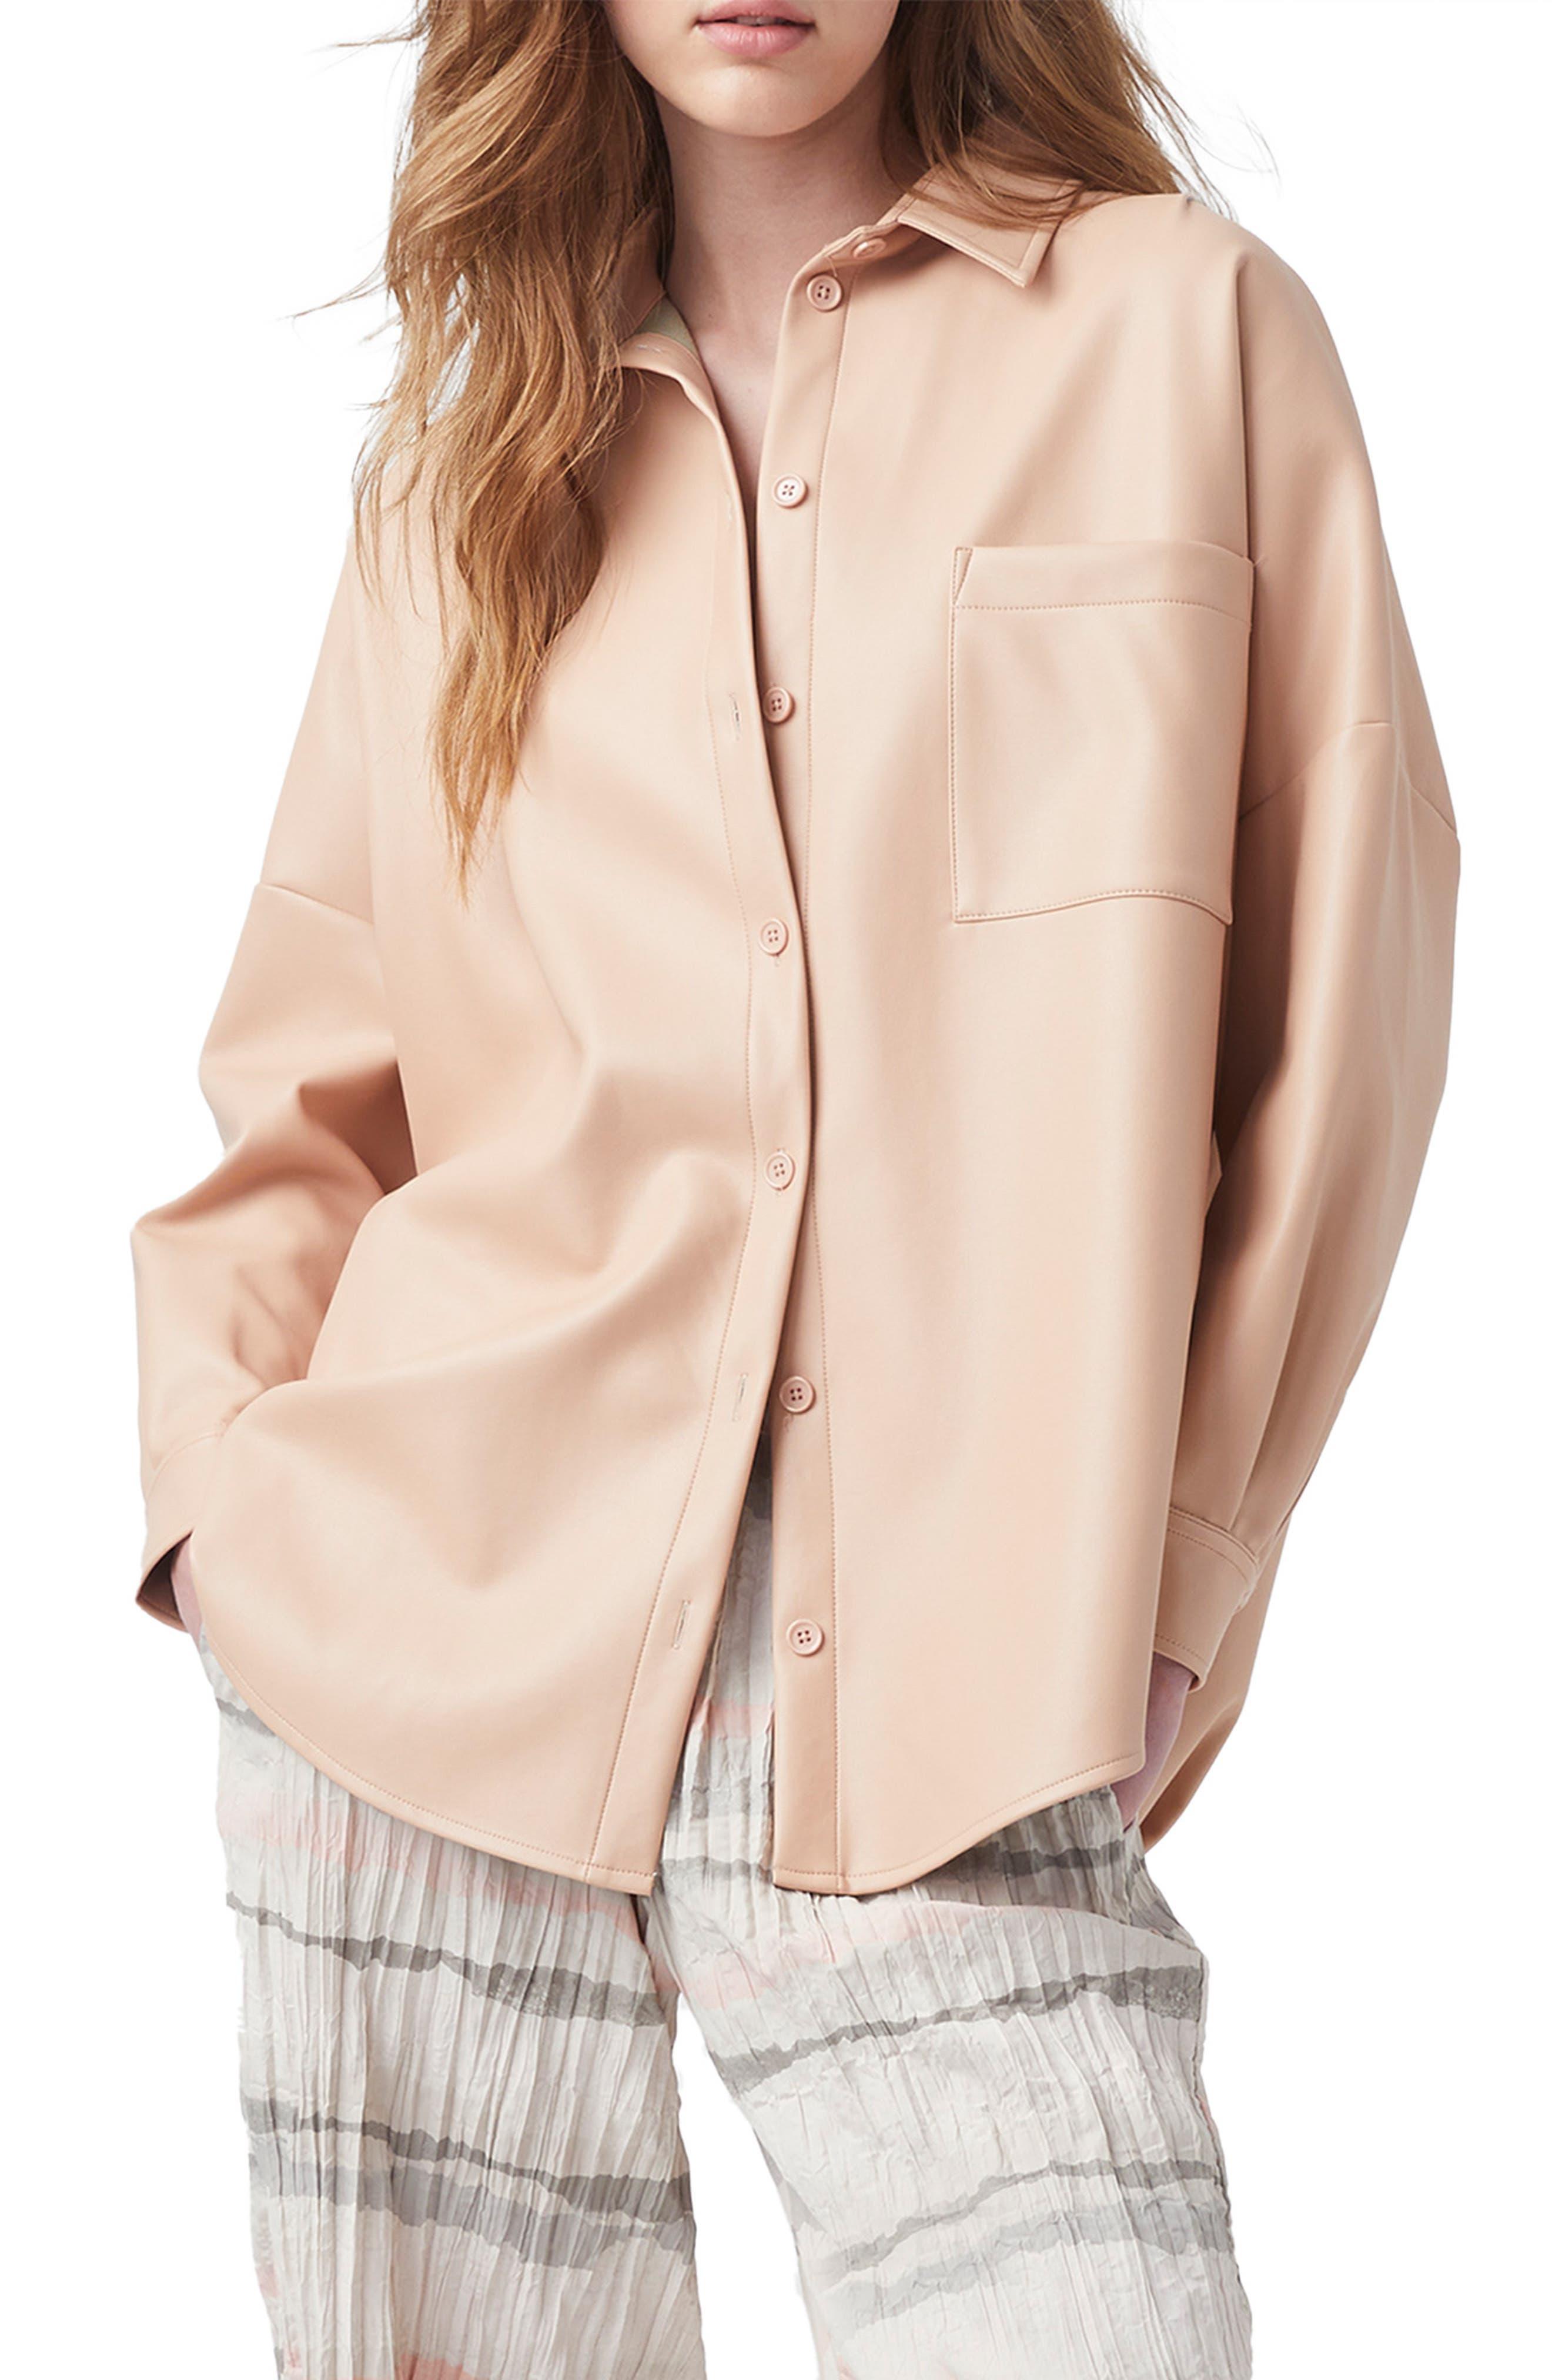 Crolenda Faux Leather Shirt